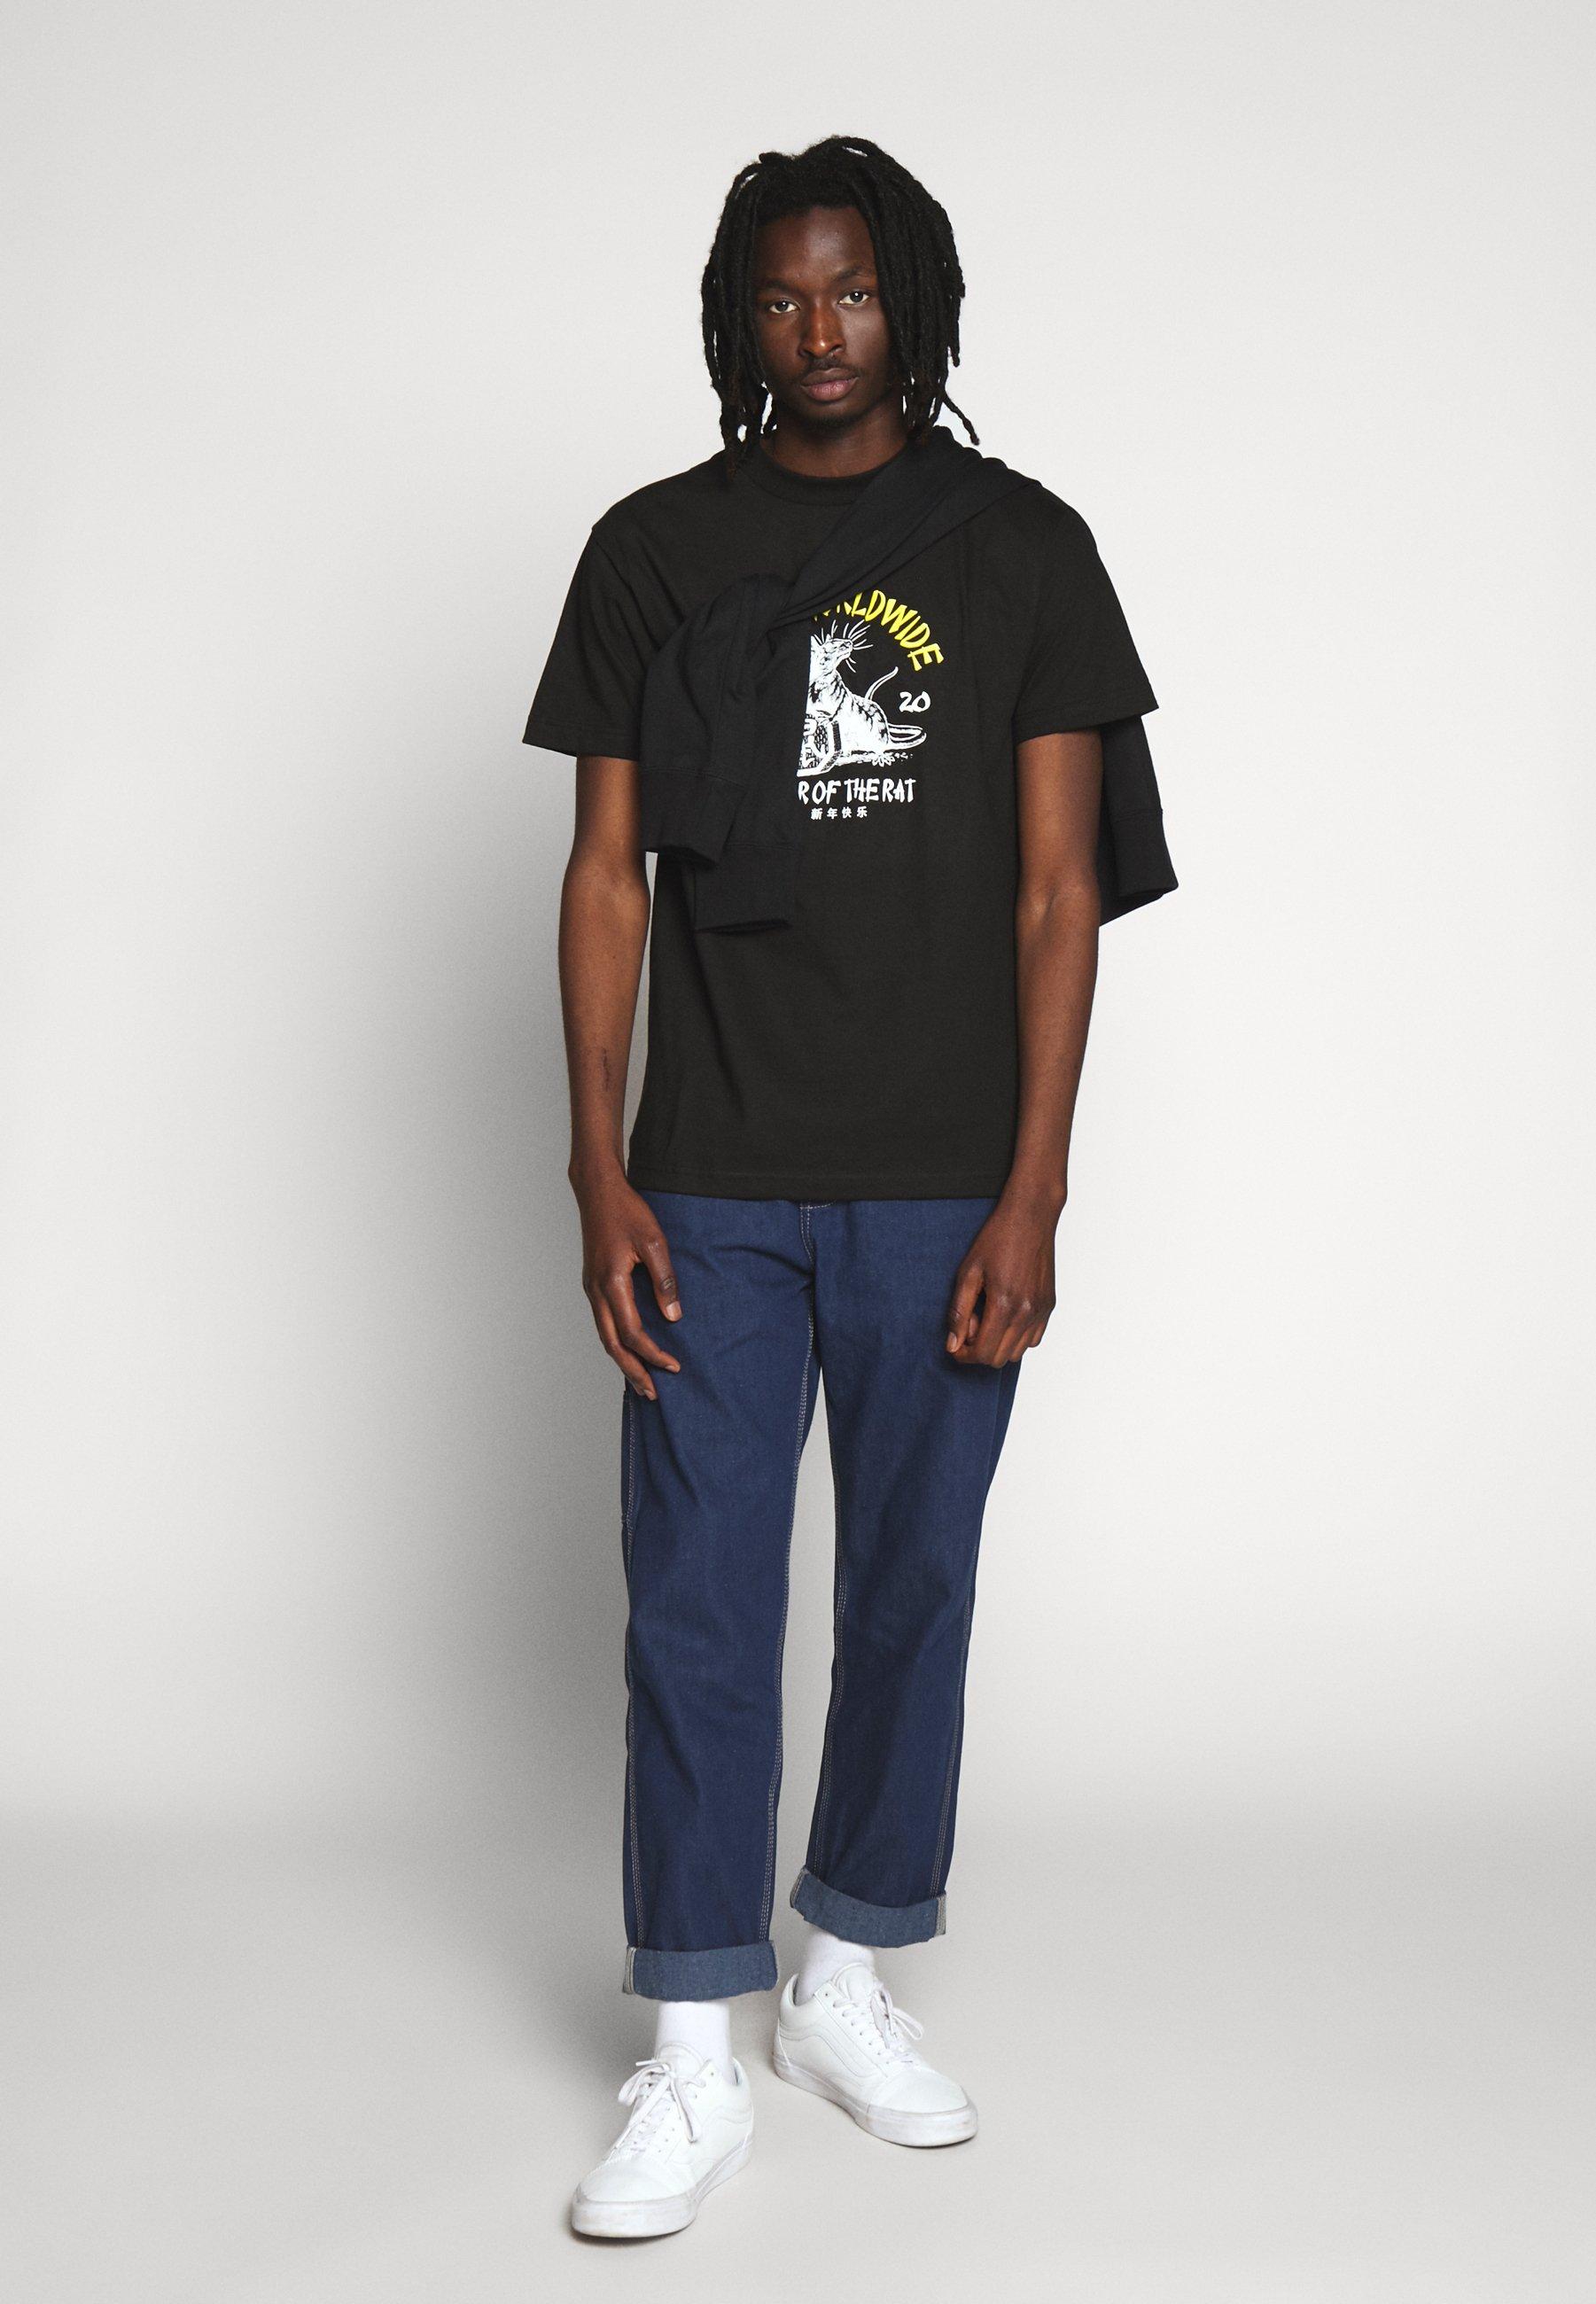 Huf Year Of The Rat Tee - T-shirt Med Print Black